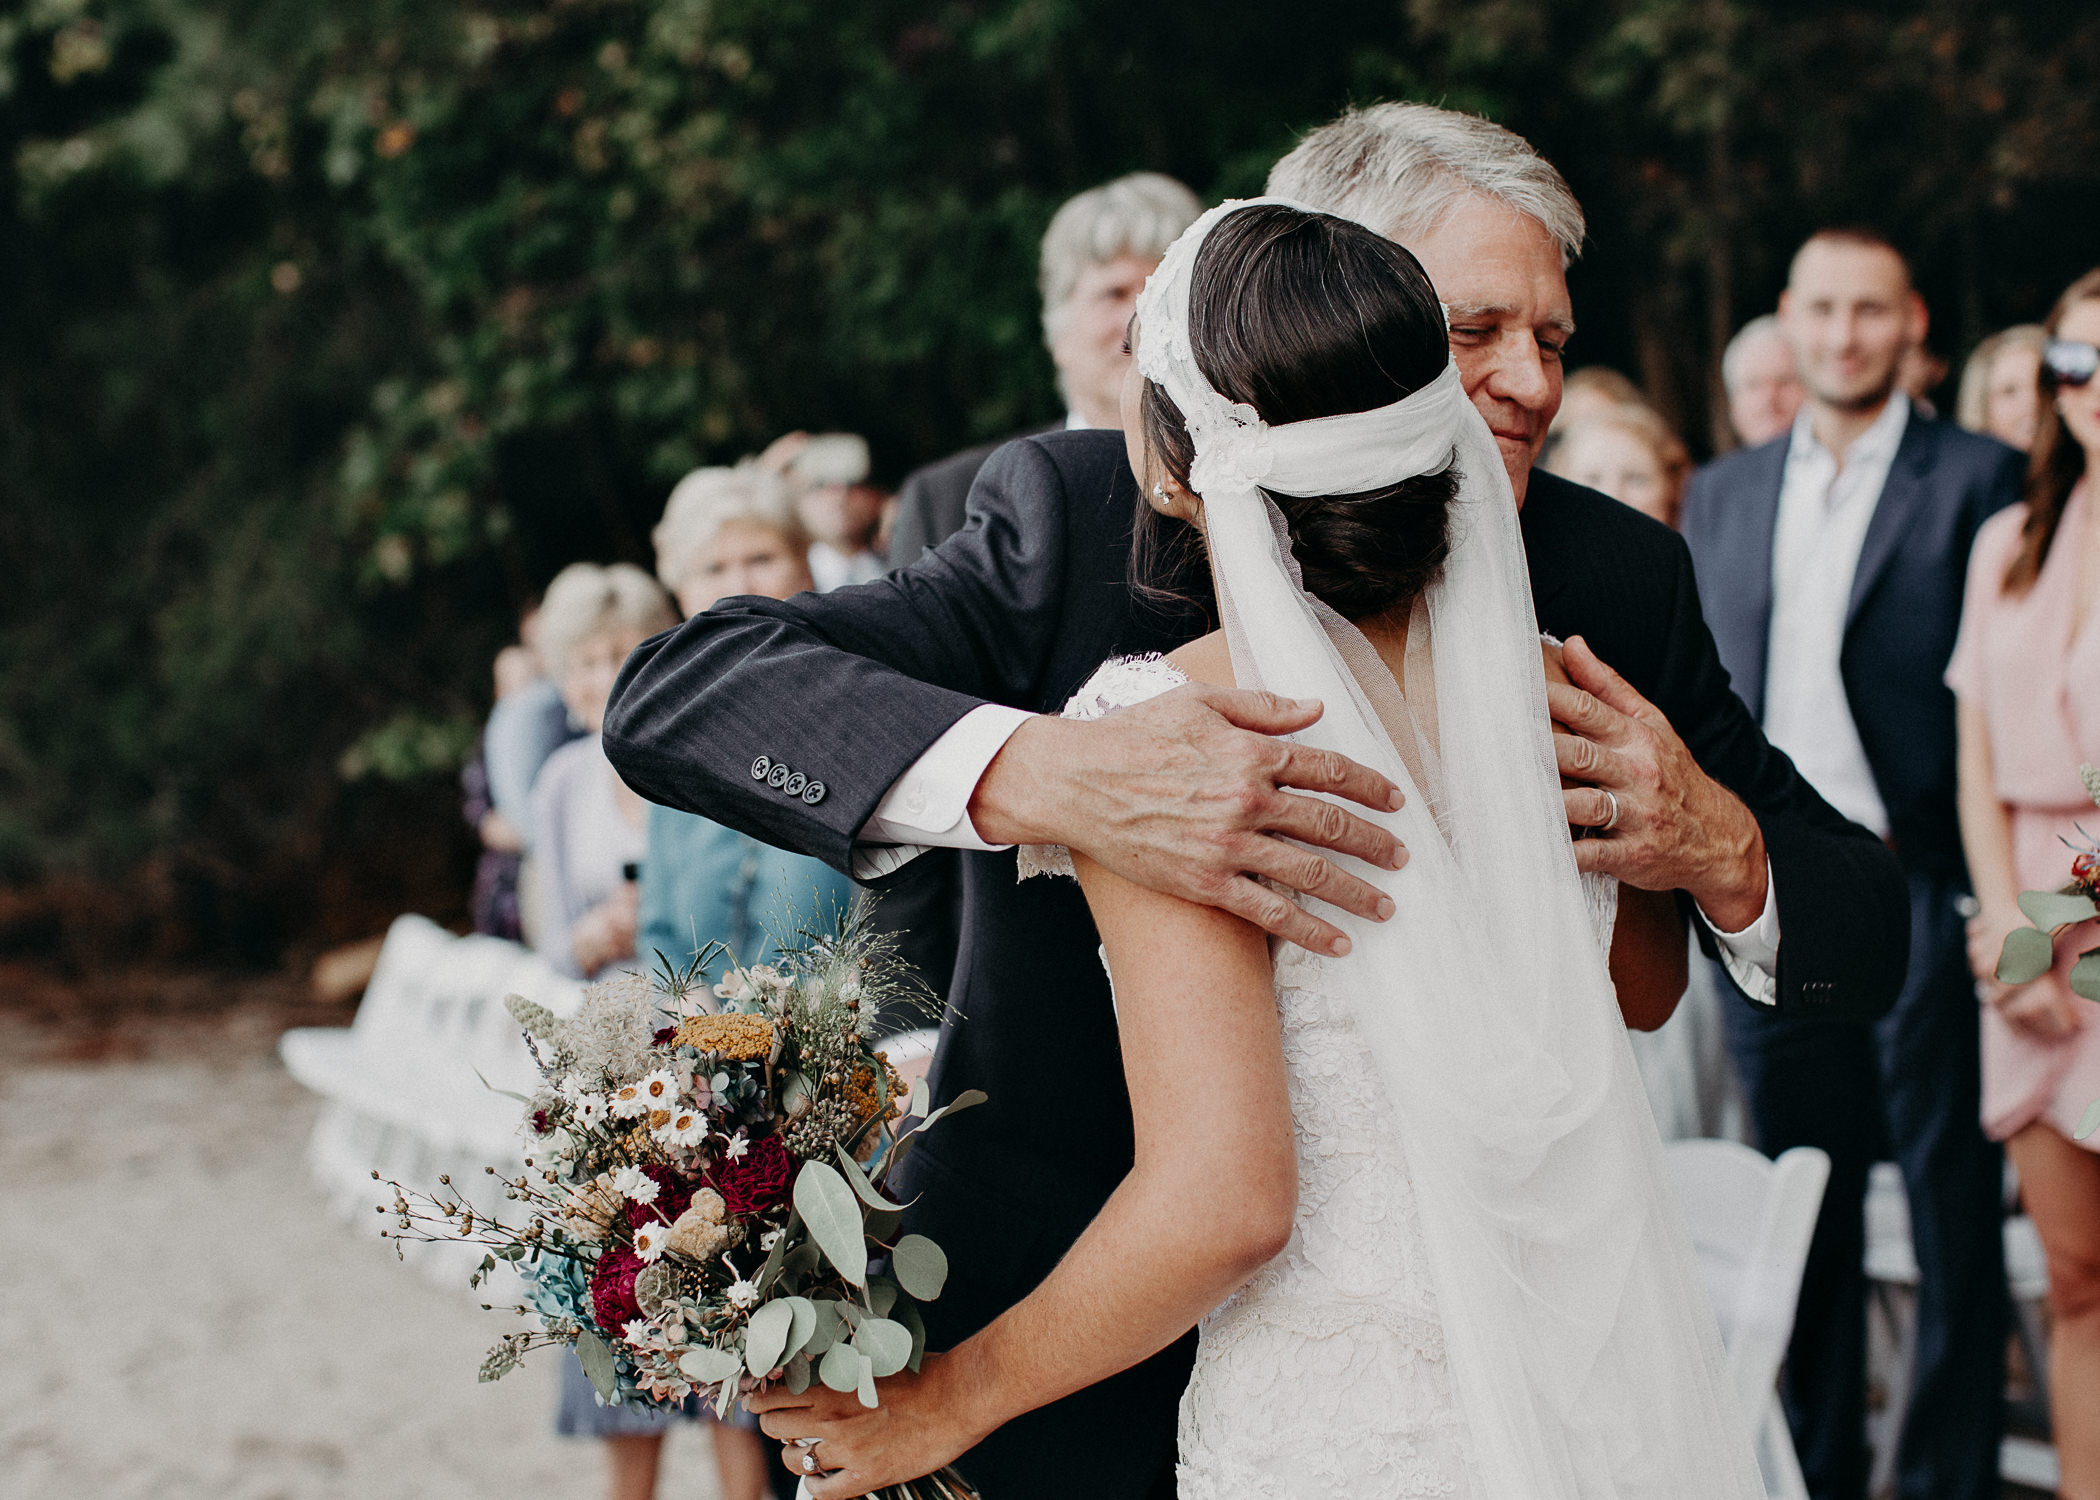 97 - Bride walking down the aisle -  Wedding Ceremony - Destination Wedding : Beach : Lake Wedding Atlanta Wedding Photographer .jpg